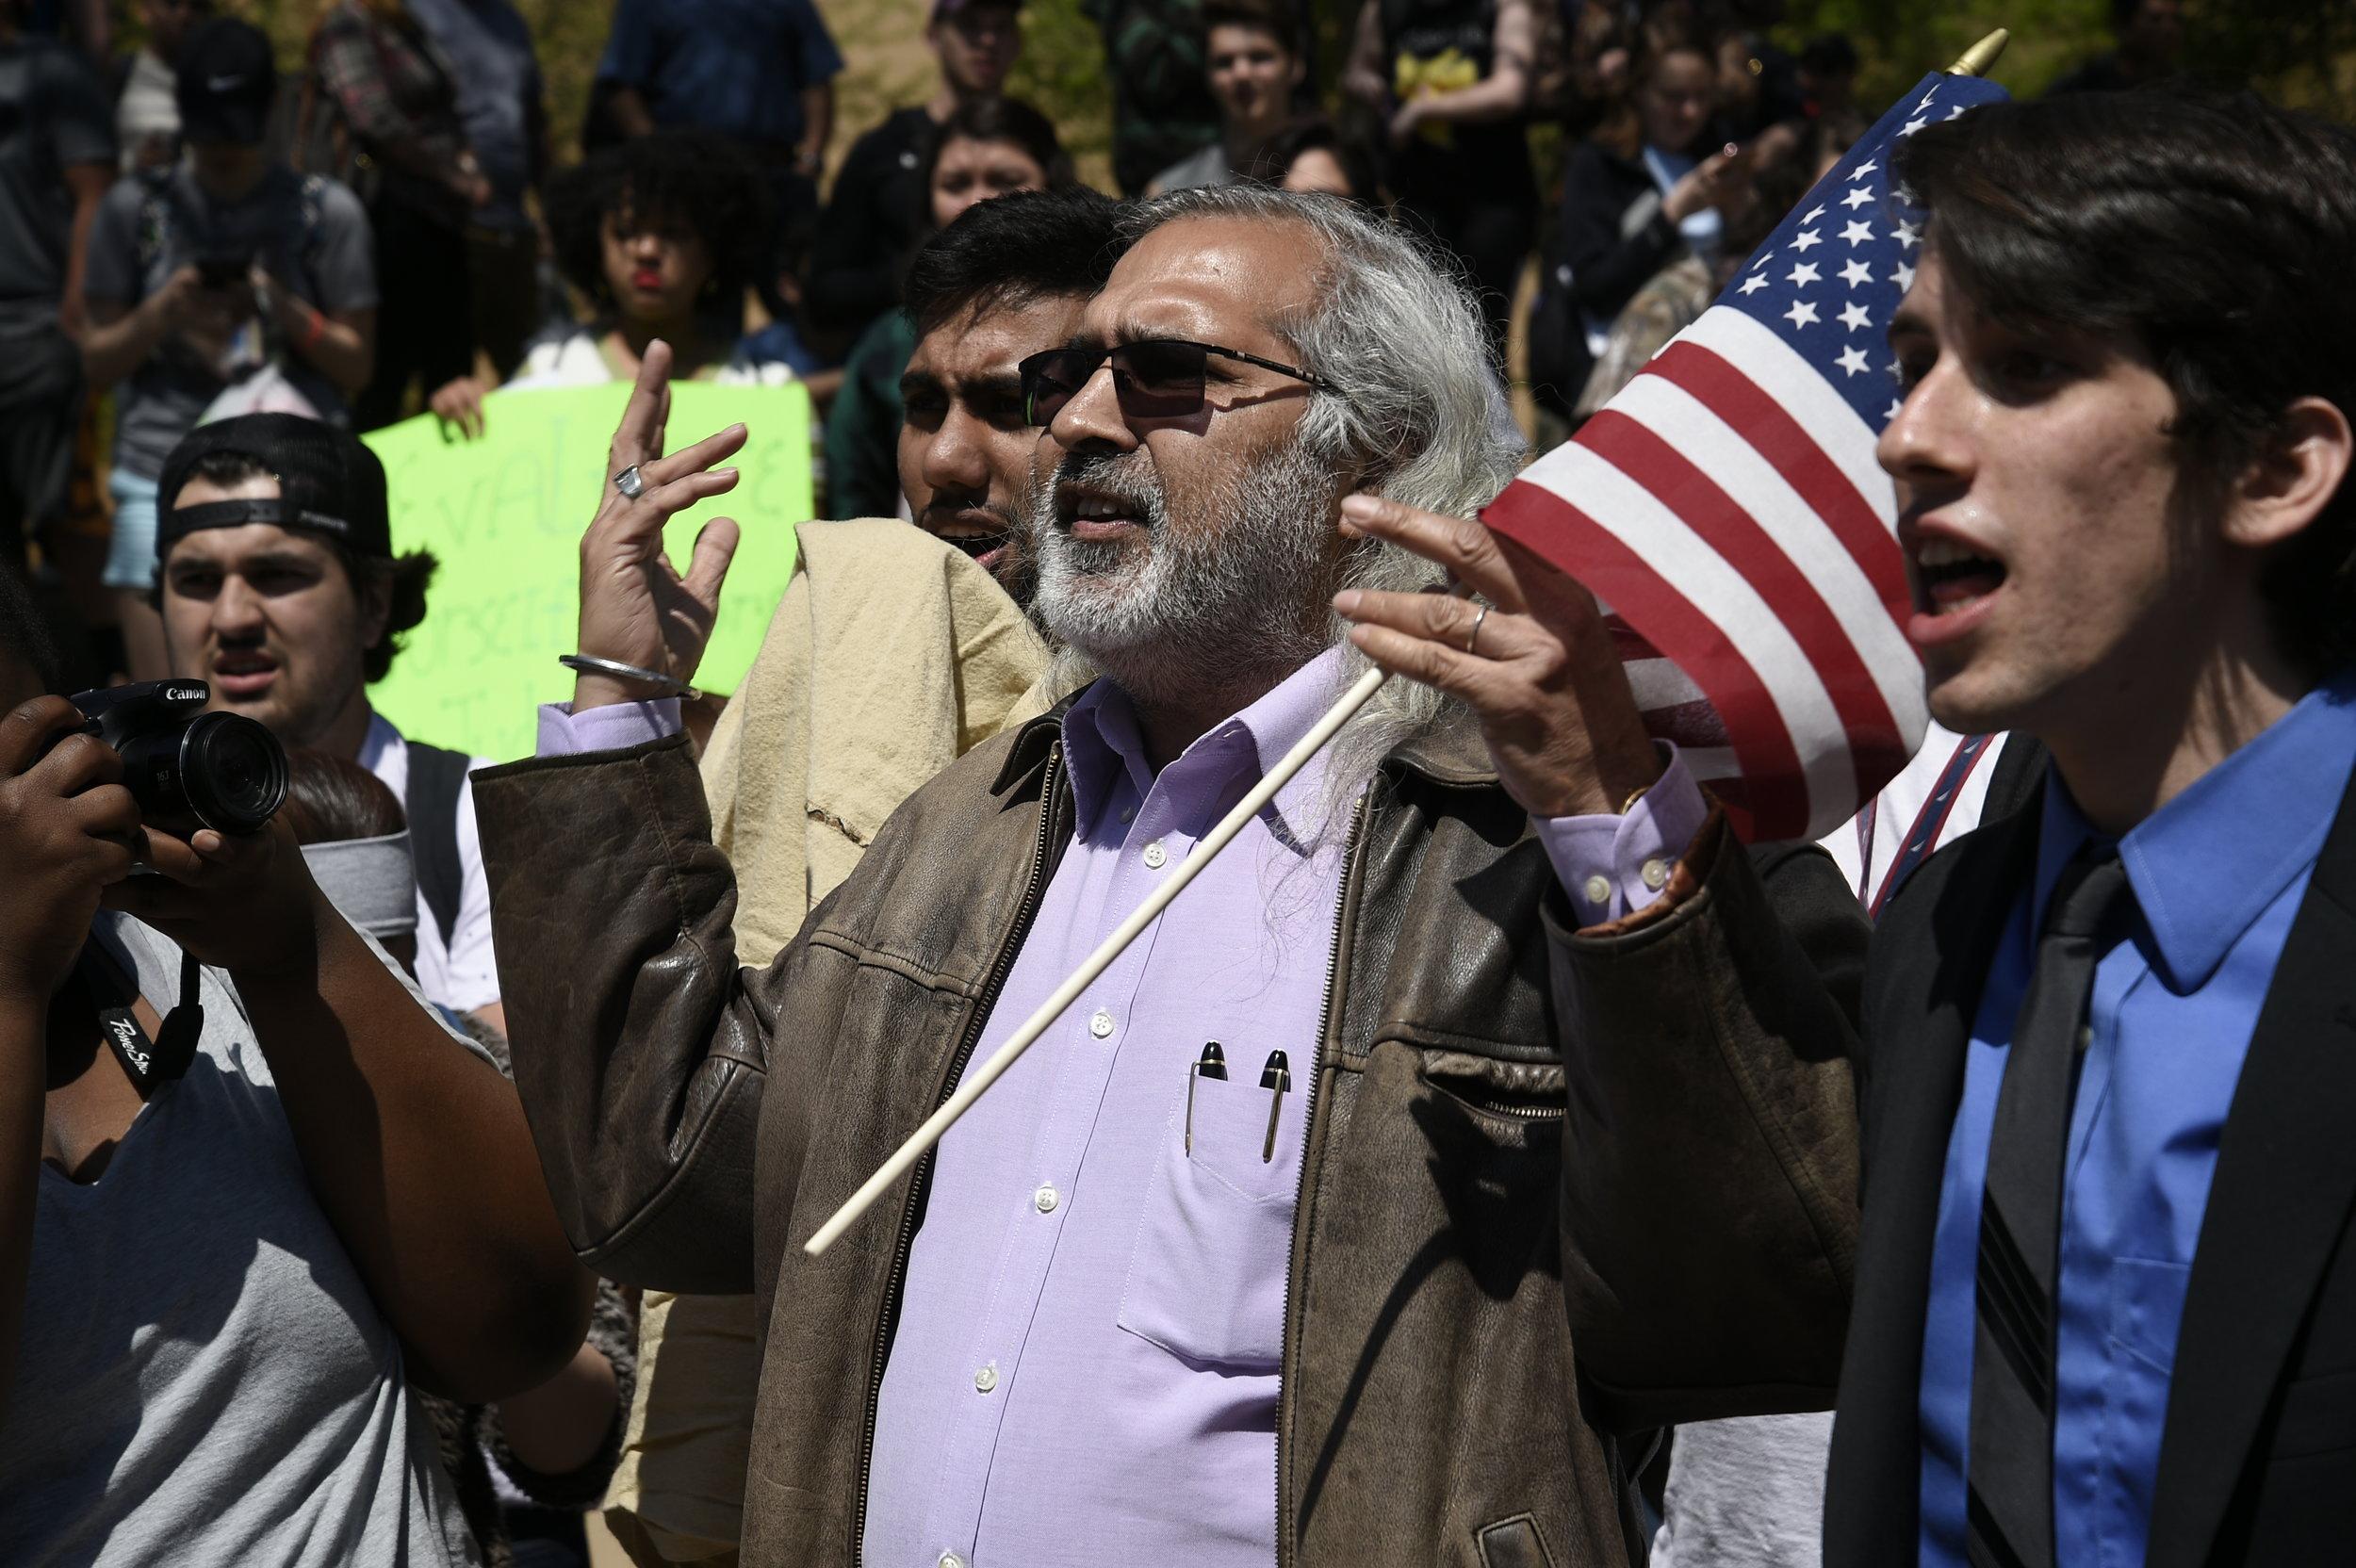 UNT professor Masood Raja debates with street preacher at a protest.